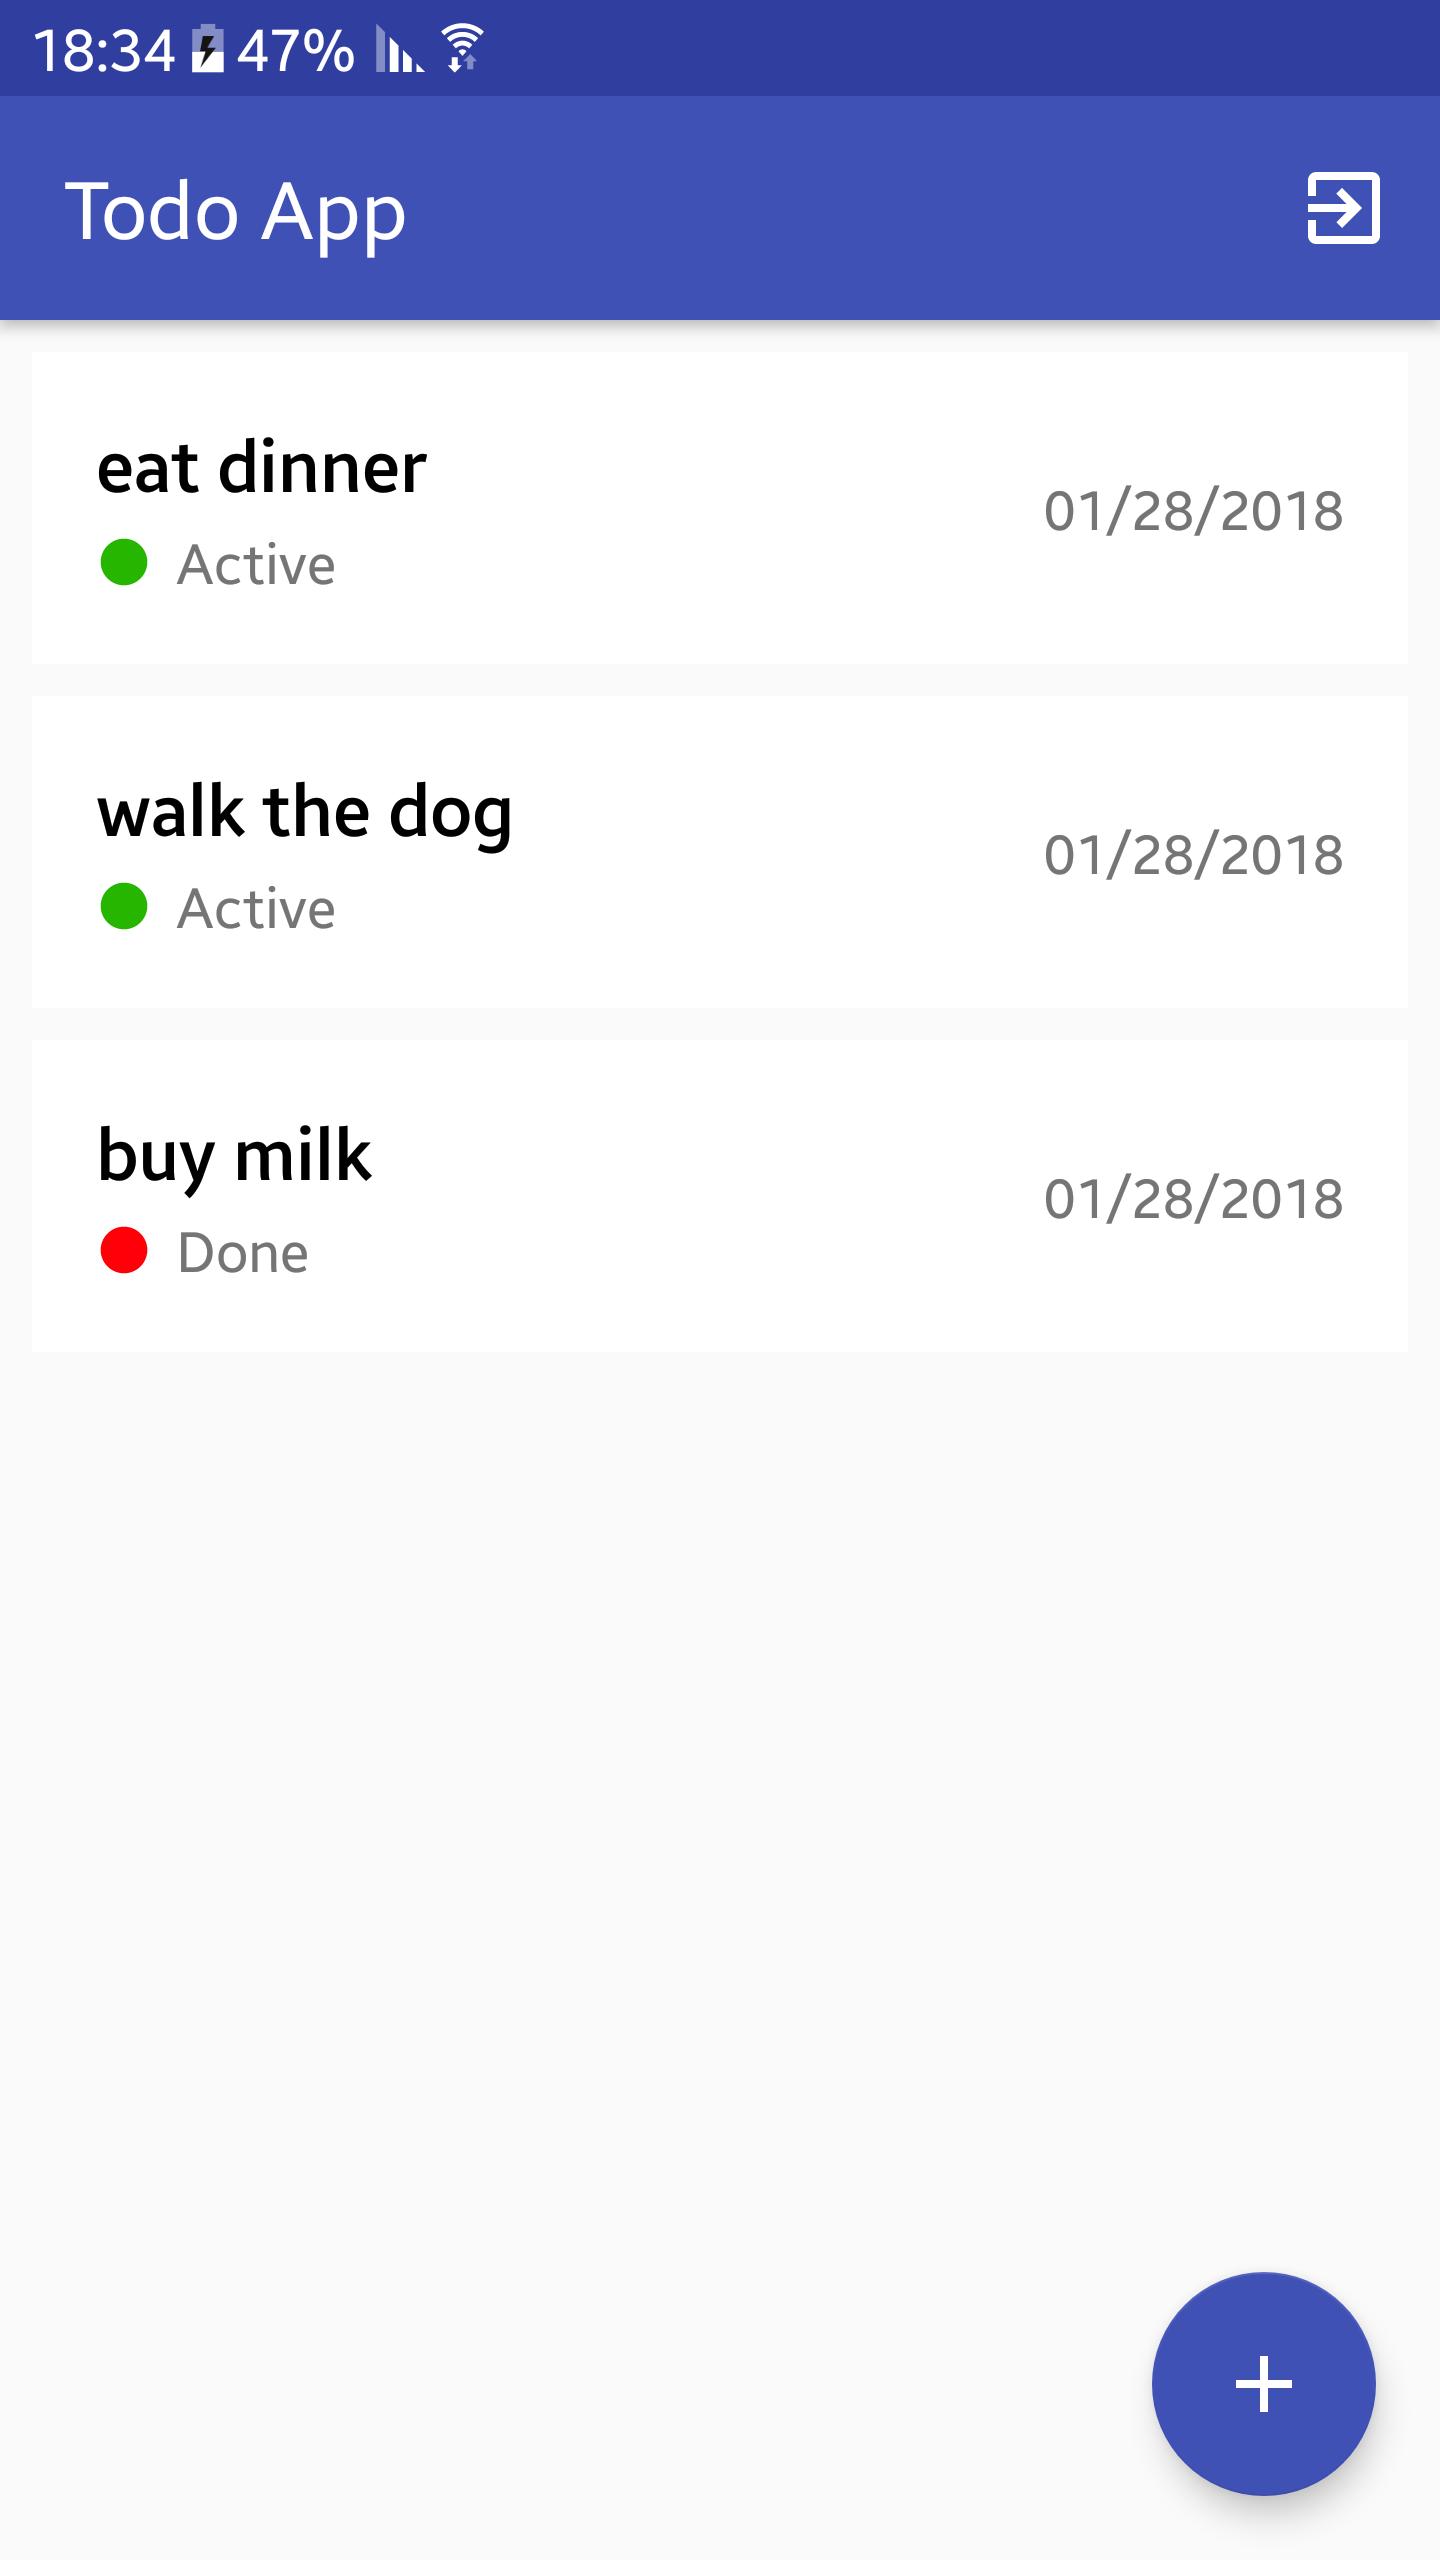 GitHub - stavelmashally/android-mvp-todoapp: Sample app